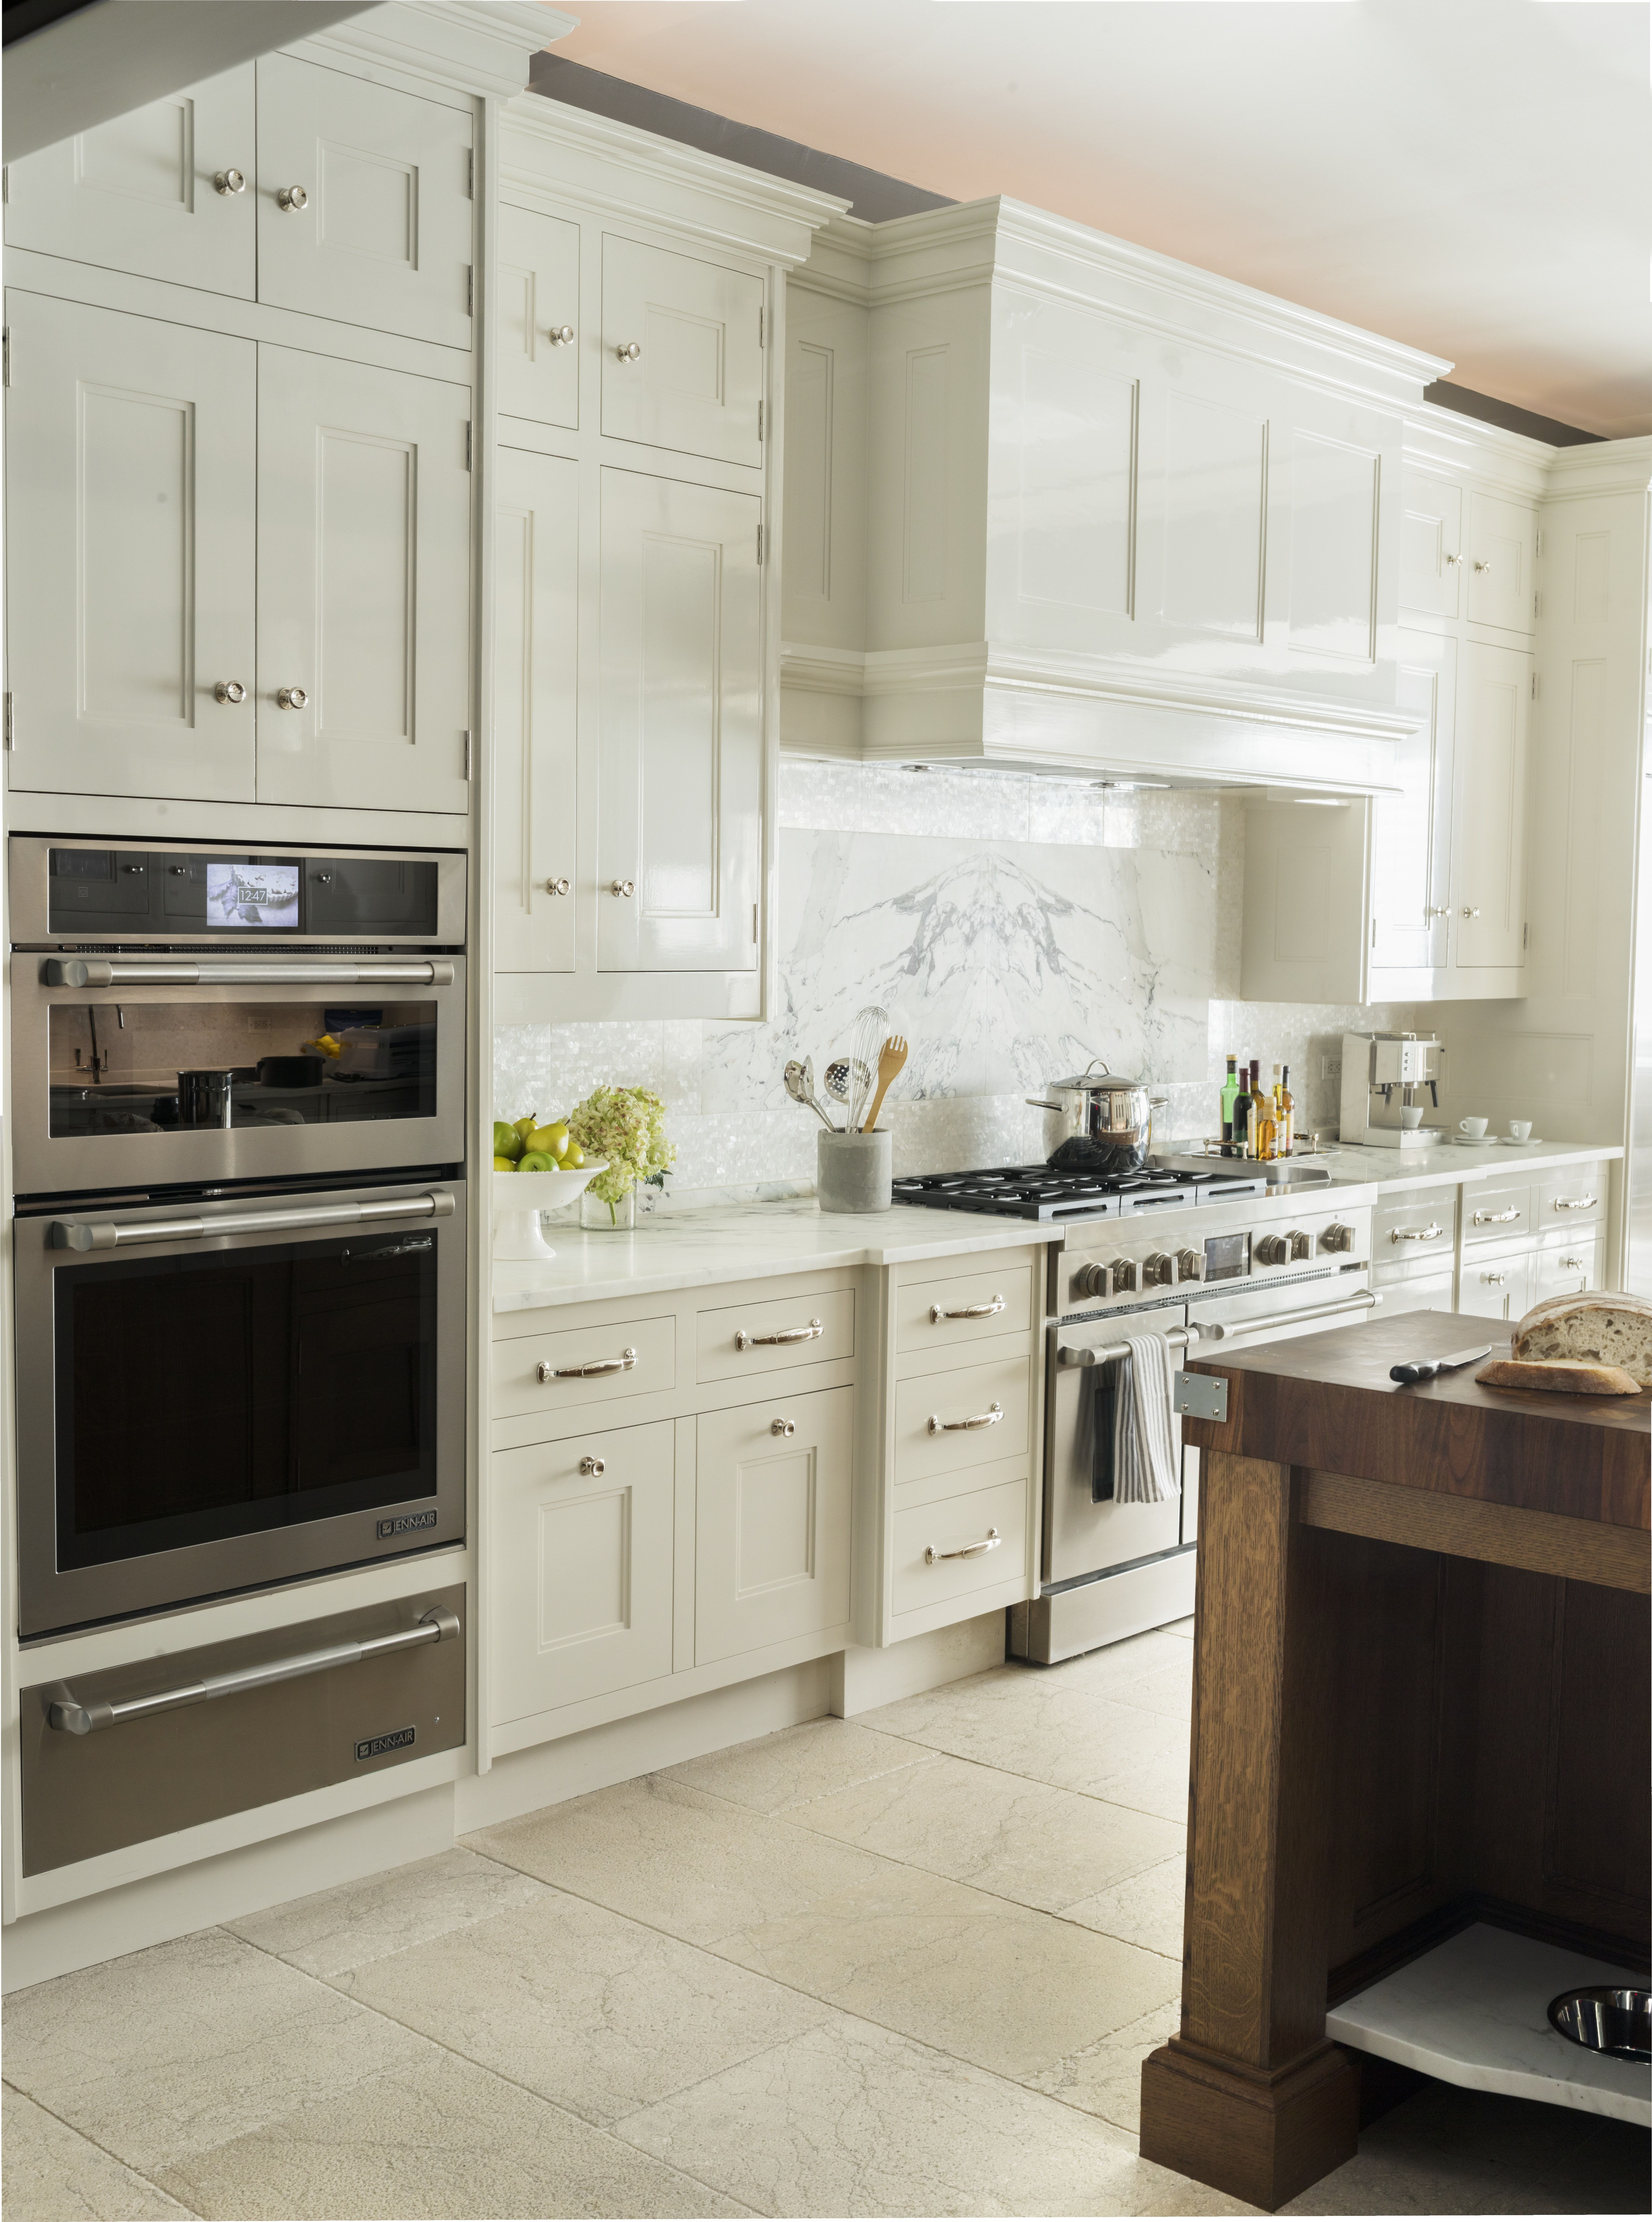 Transitional Kitchen Cabinets Polished Nickel Hardware High